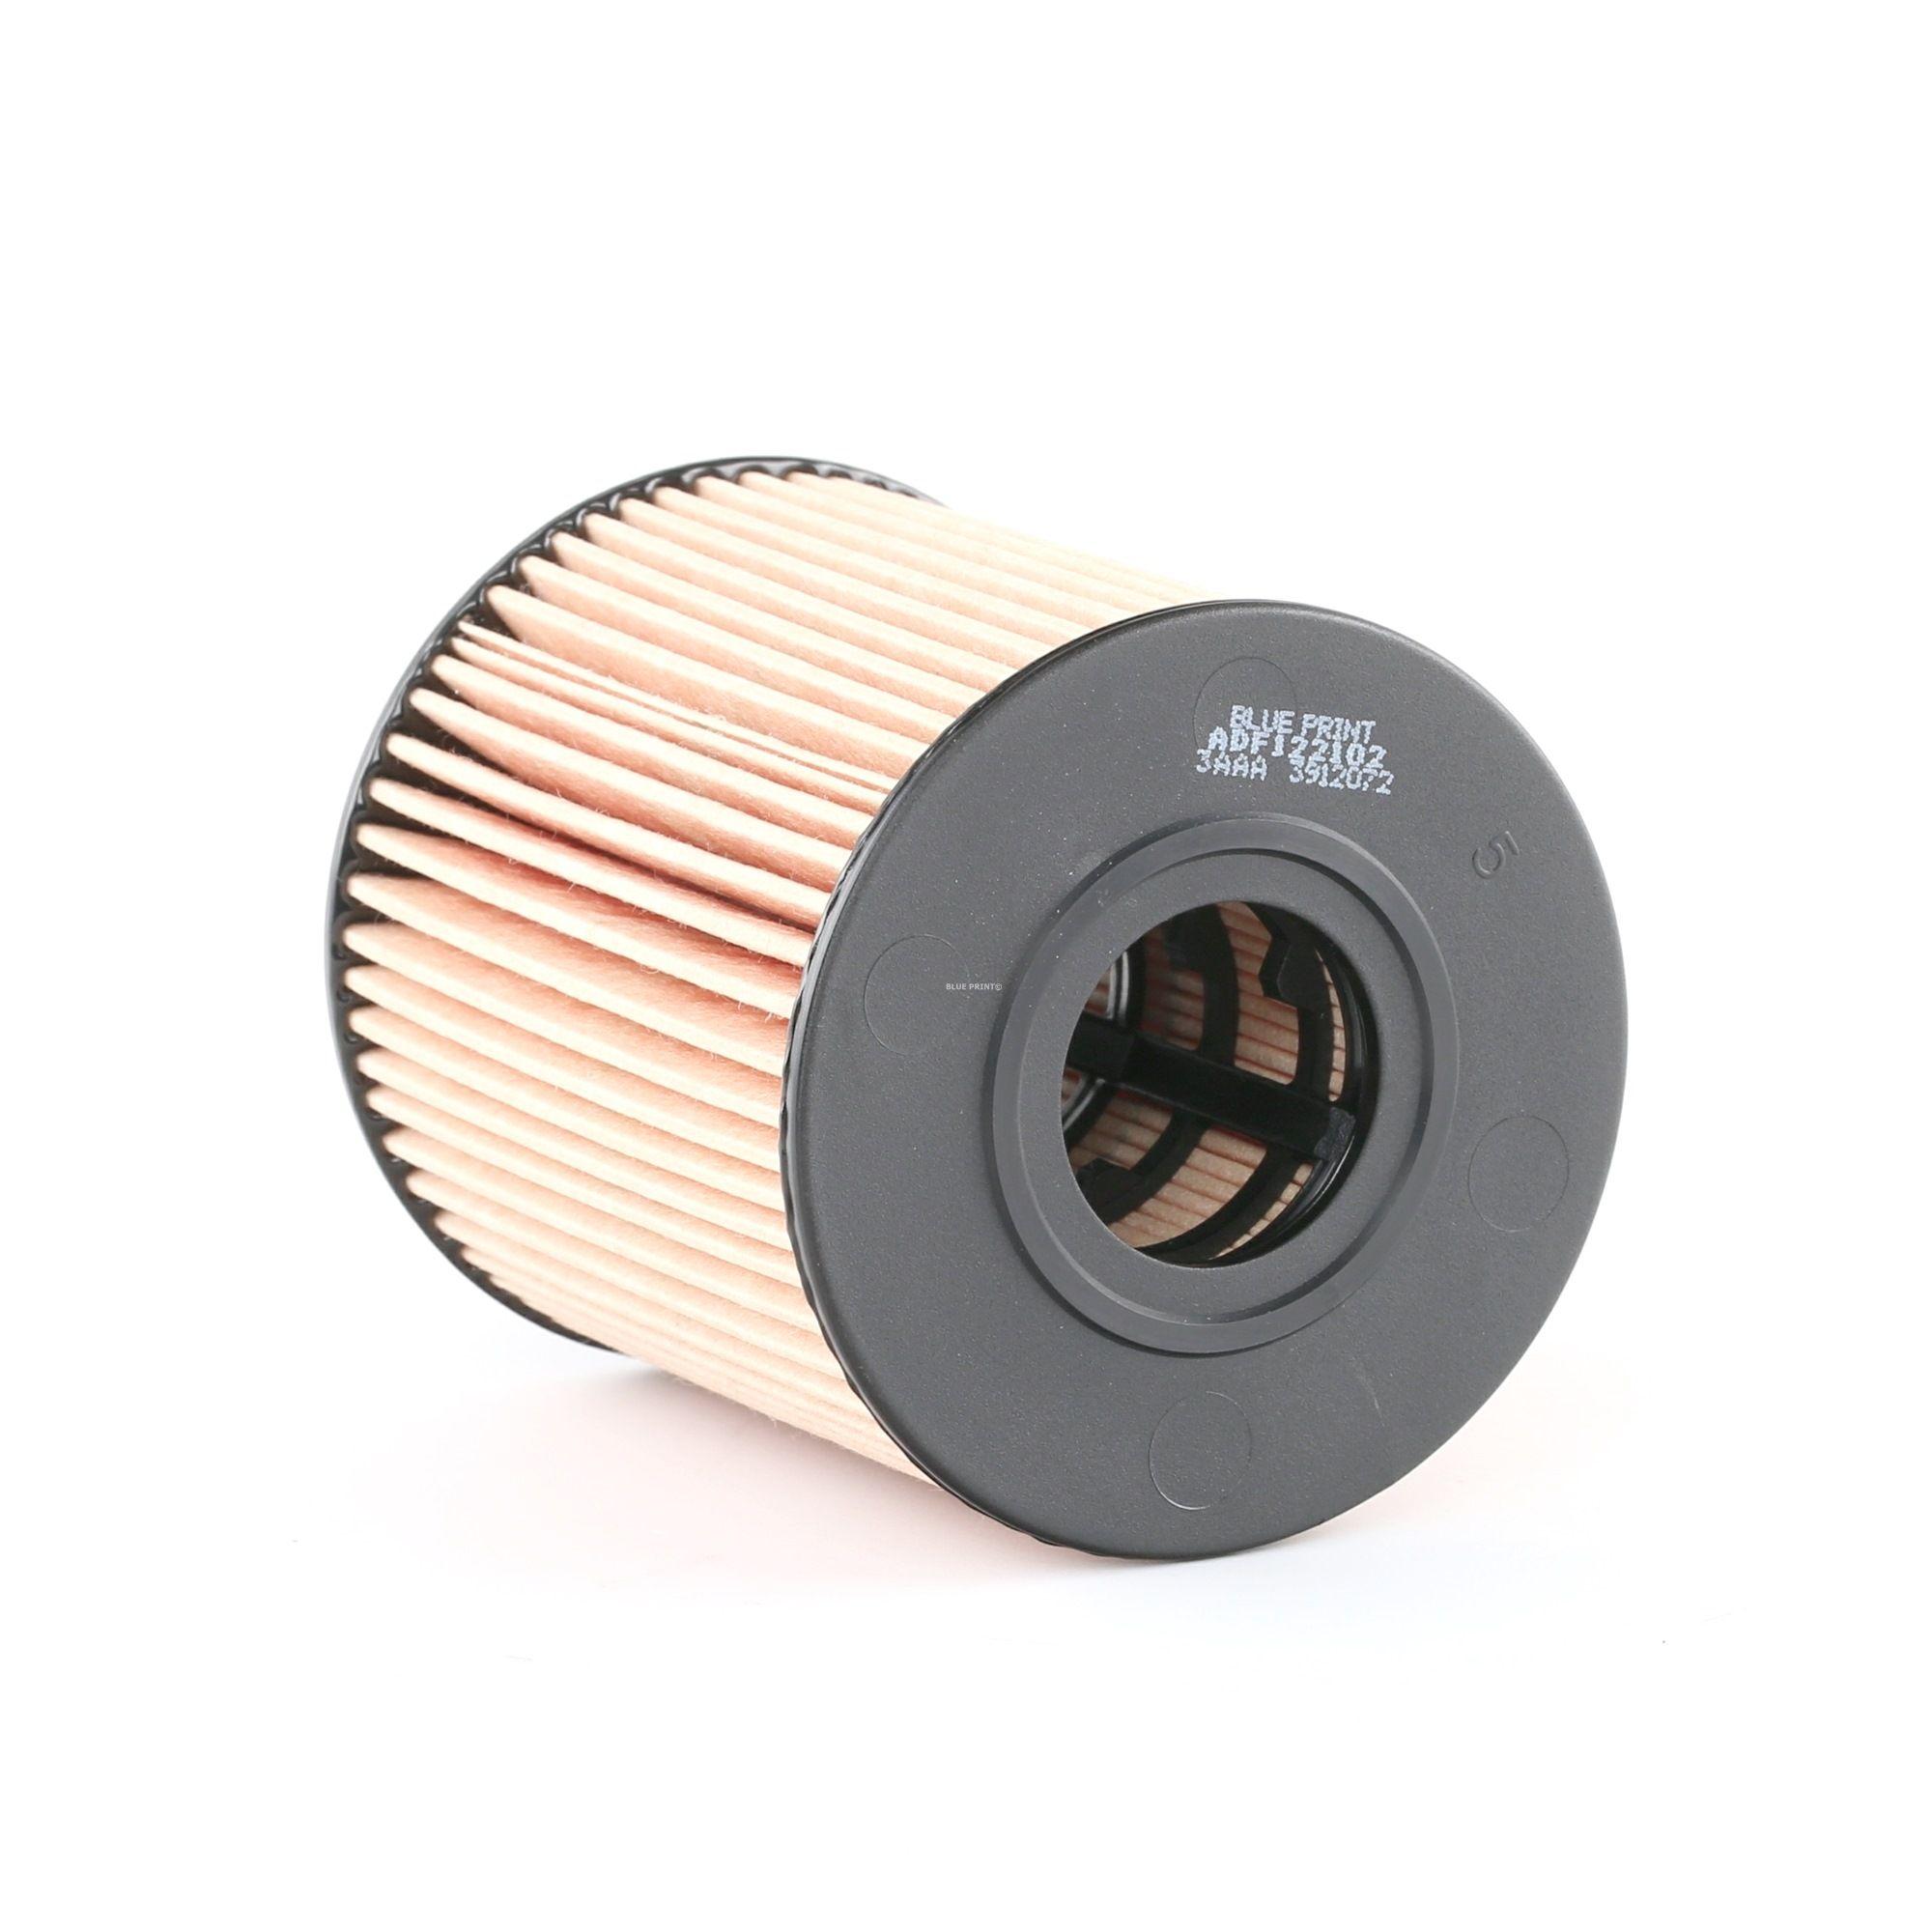 Engine oil filter BLUE PRINT ADF122102 rating